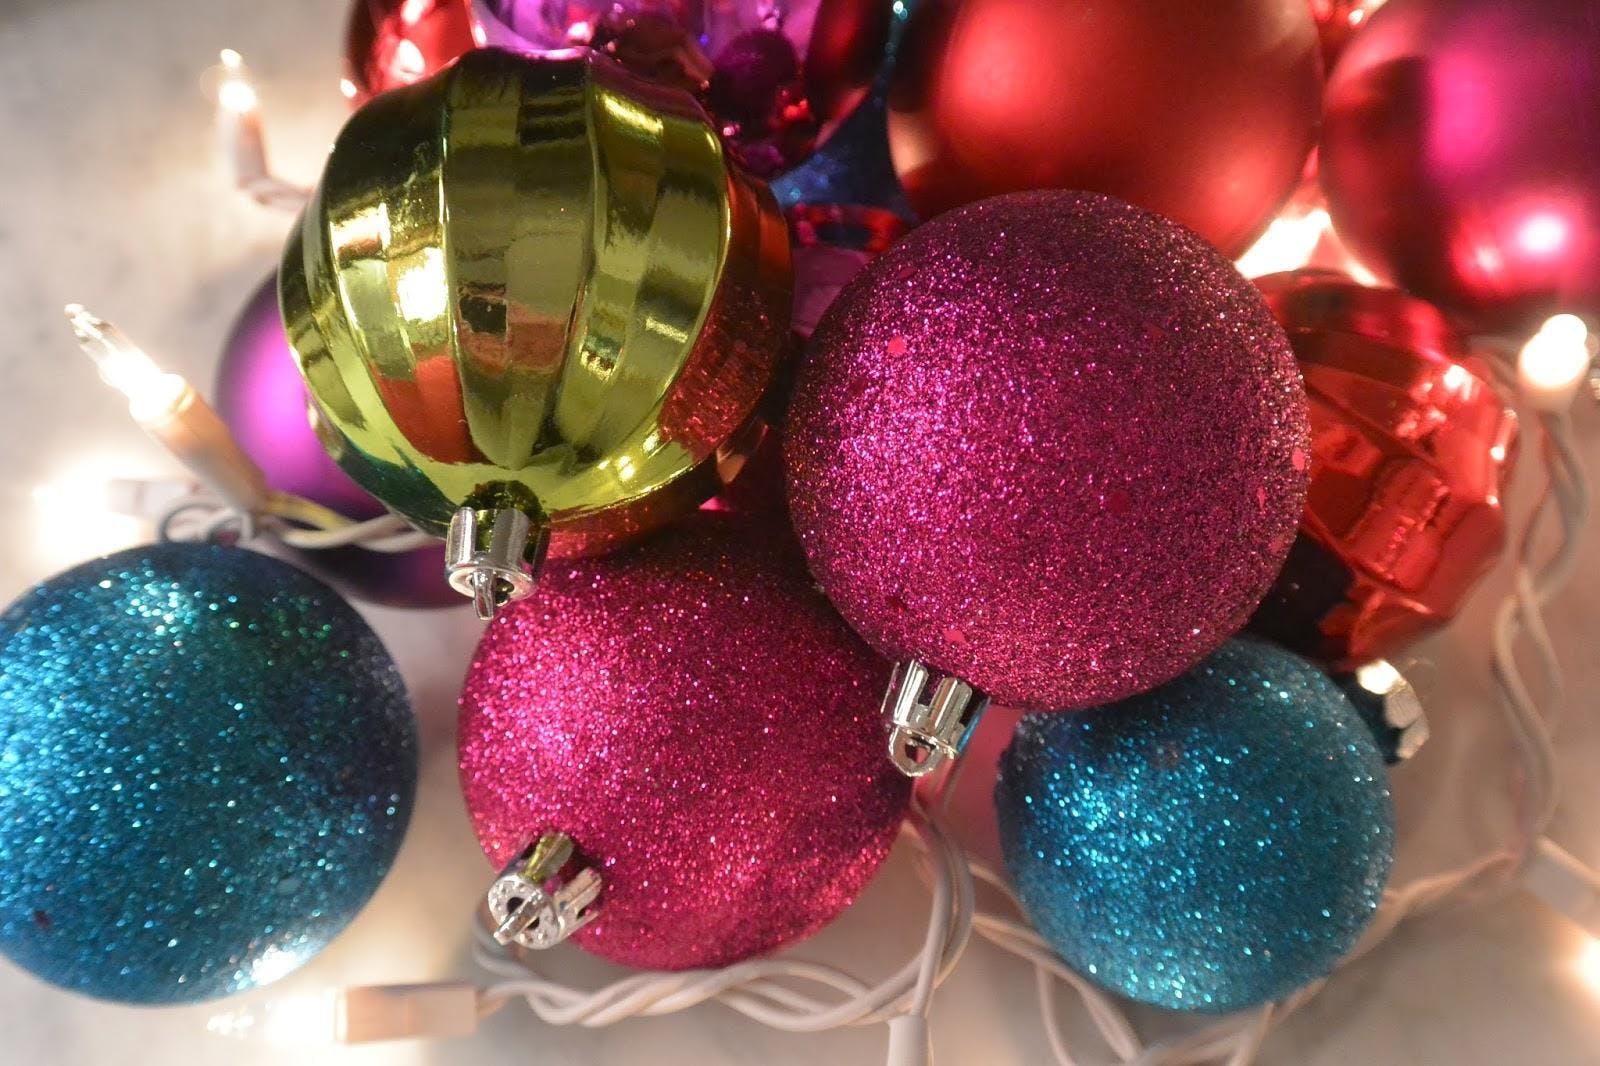 Wine drinking & Ornament Decorating